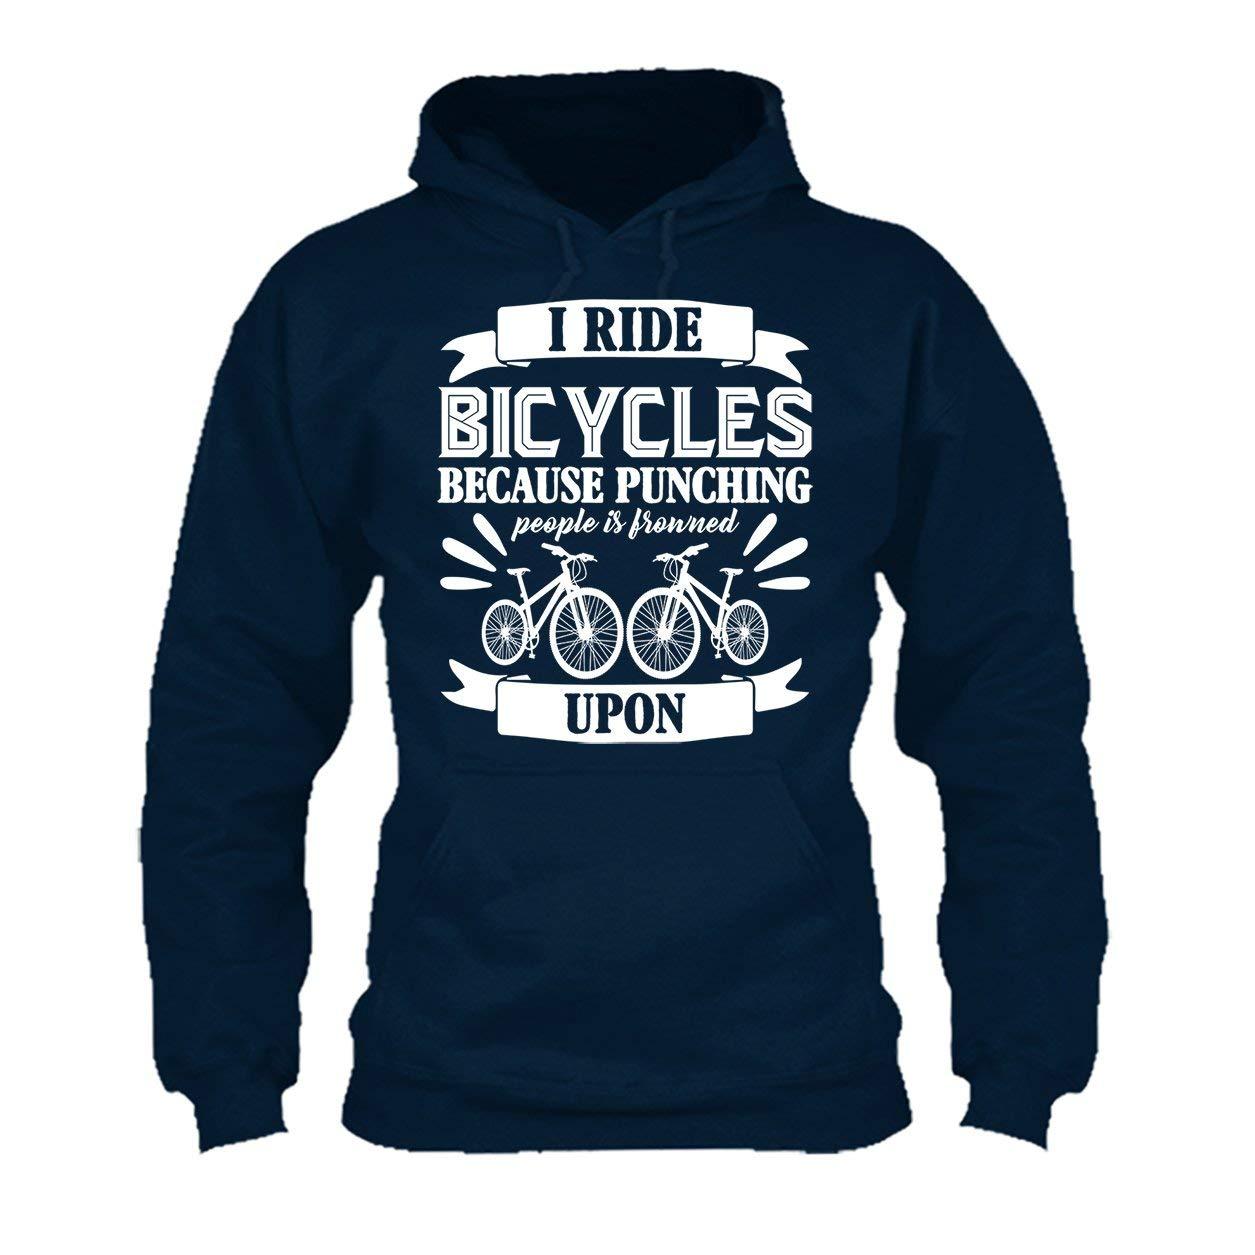 Short Sleeve Shirts Cycling I Ride Bicycles Tee Shirt